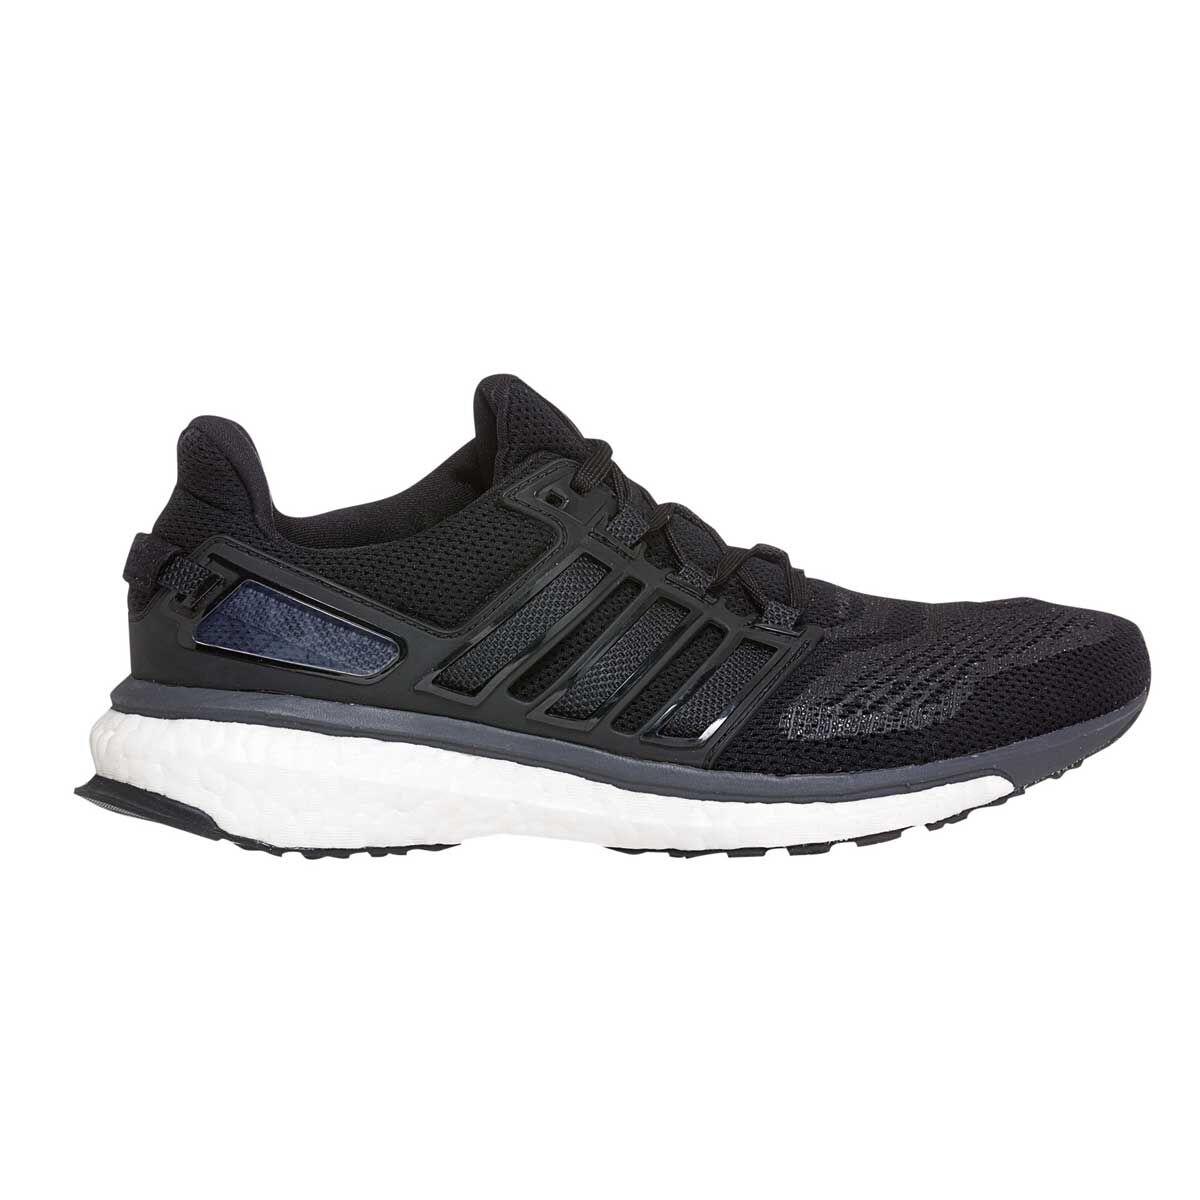 3a5c8c4b7d2b ... dark grey dgh solid grey ae281 14fa1  norway adidas energy boost 3  womens running shoes black us 7 black rebelhi res 9582f 7a399